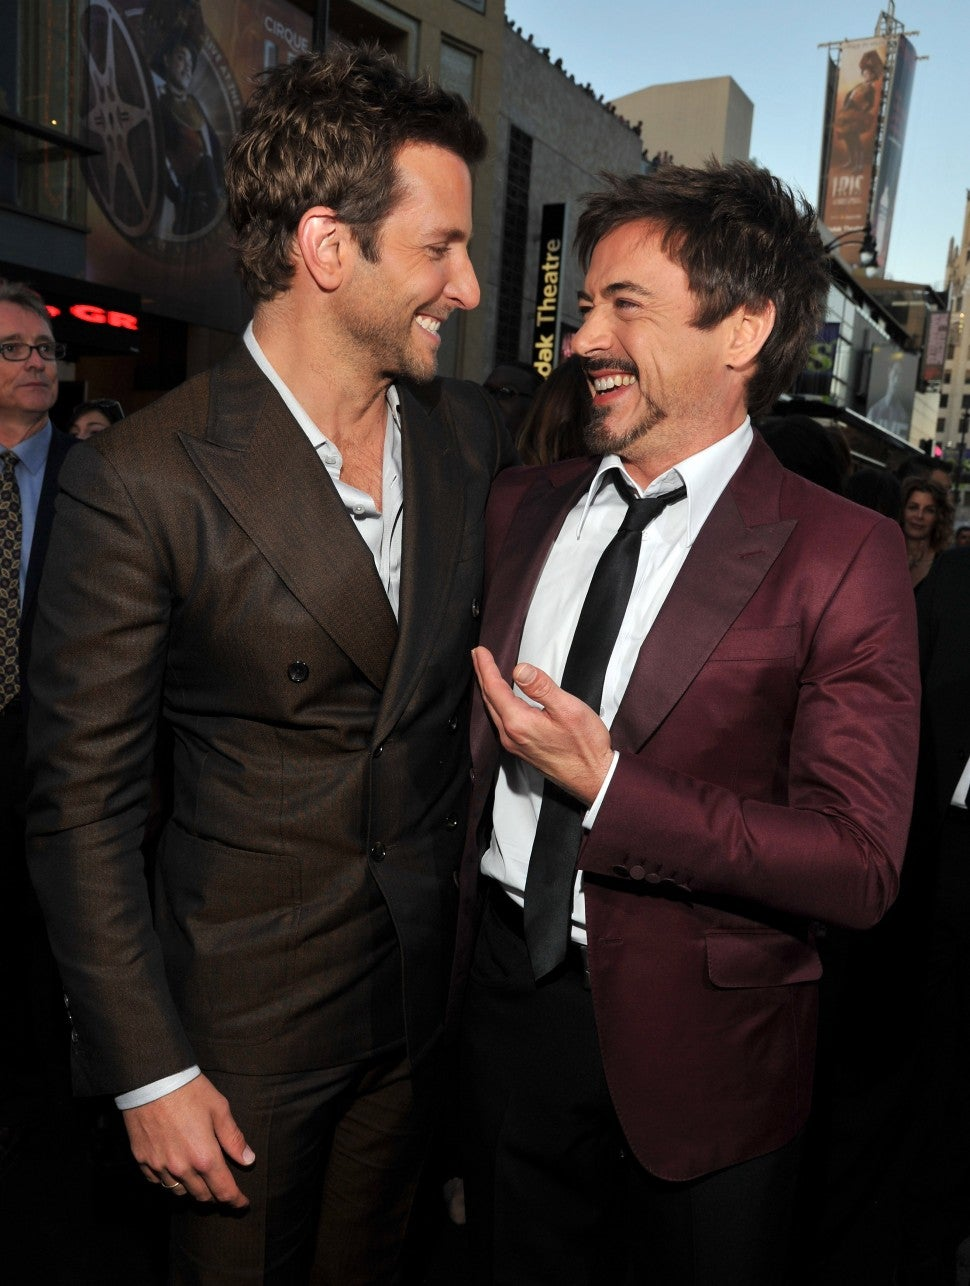 Bradley Cooper and Robert Downey Jr. arrive at